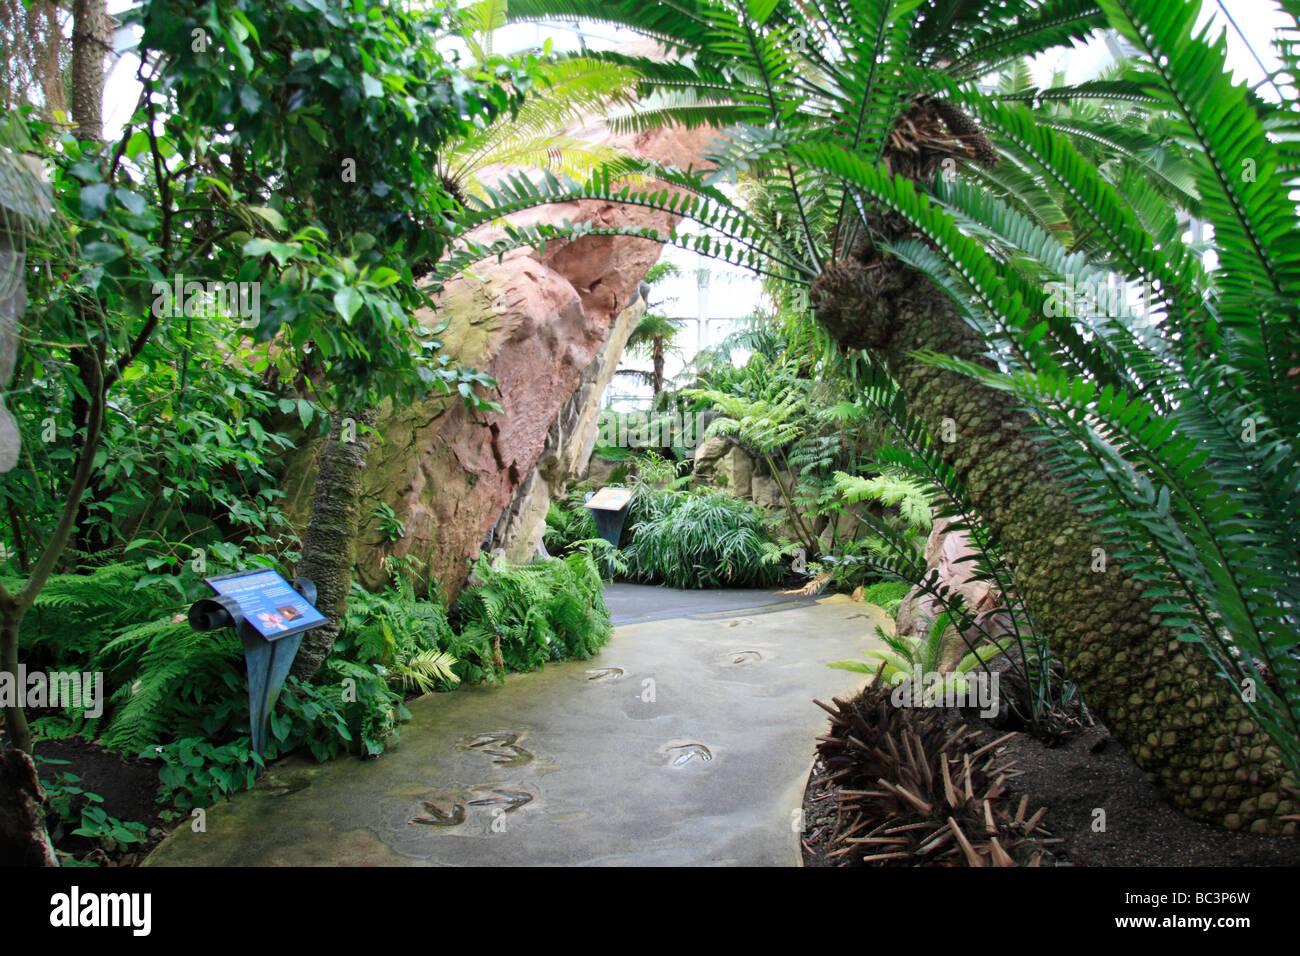 View inside Evolution House, The Royal Botanic Gardens, Kew, Surrey, England. - Stock Image